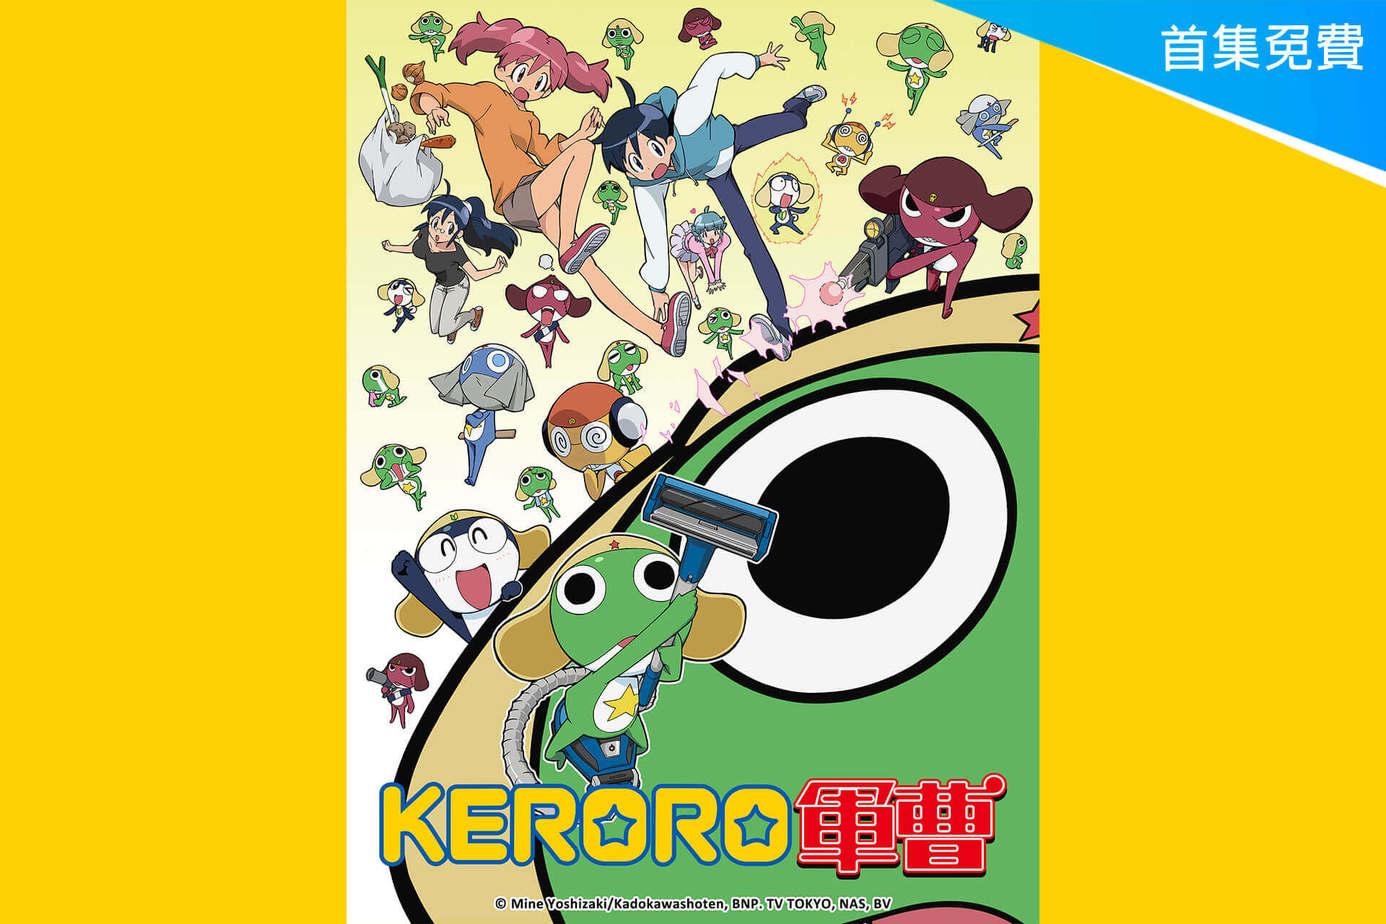 Keroro軍曹第1季